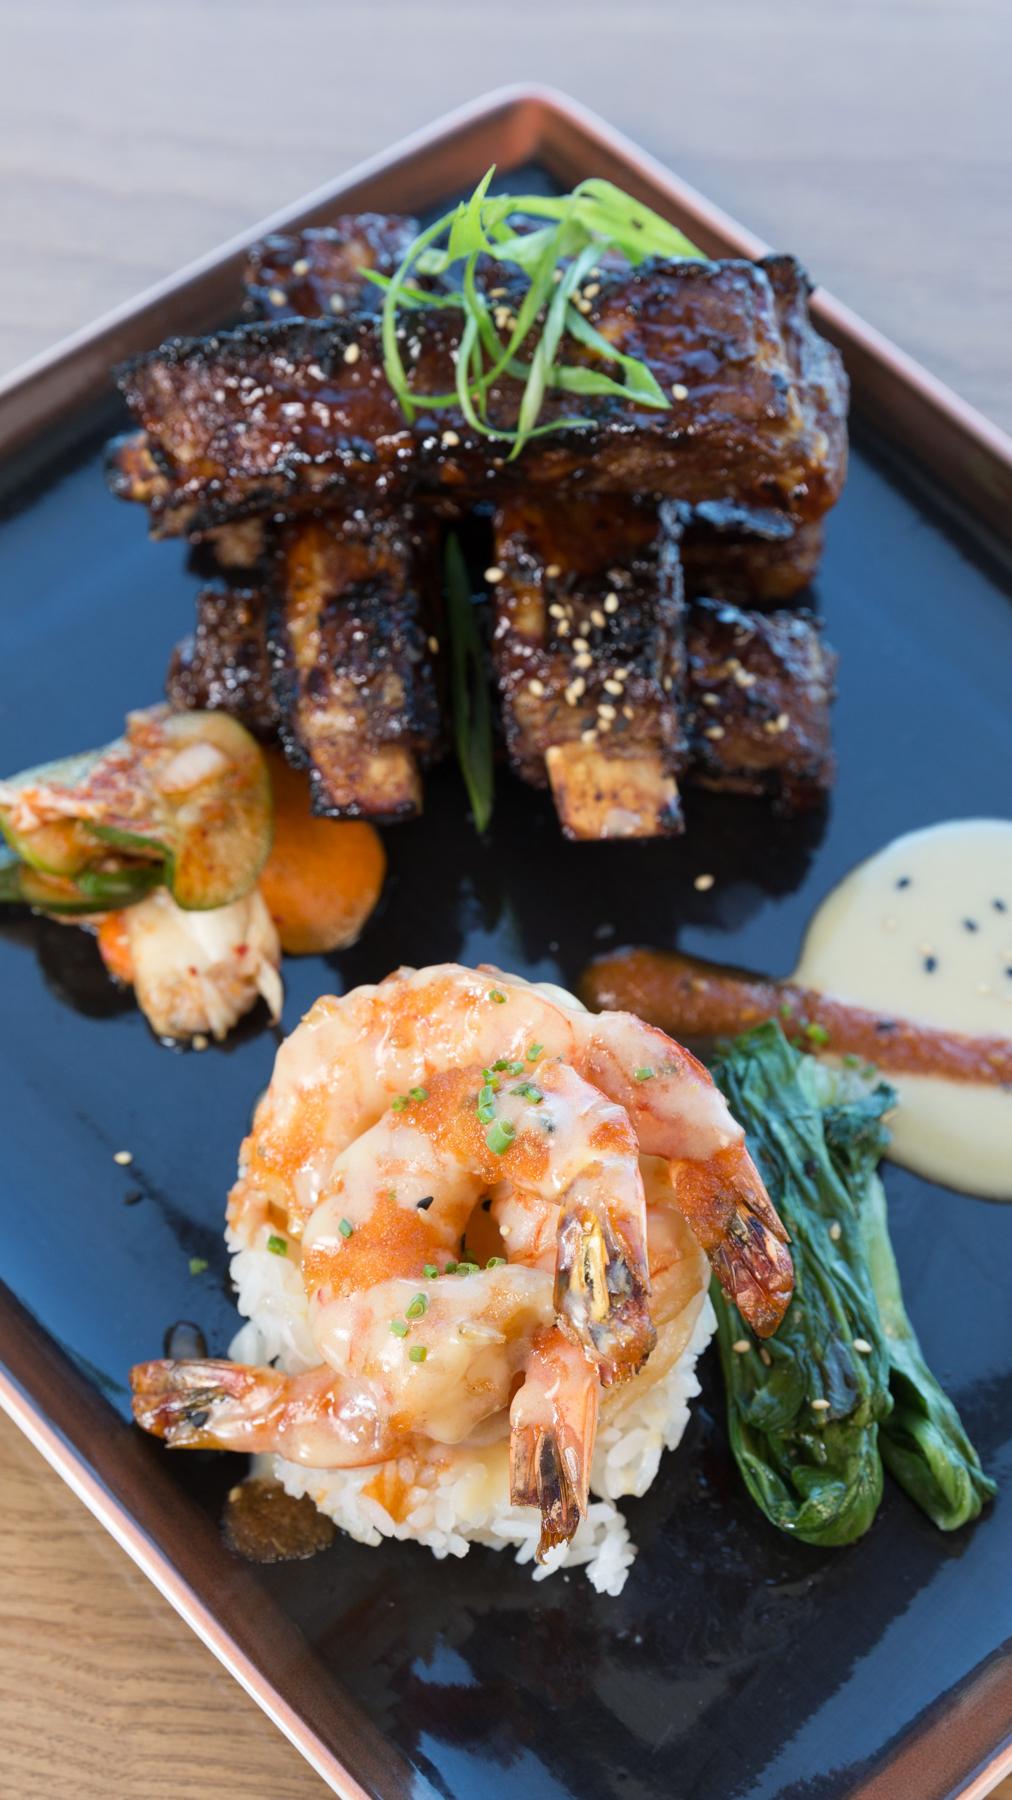 Roy's Hawaii_Dakine Combo | Grilled Szechuan Baby Back Pork Ribs, Teppan-yaki Shrimp, Firecracker Sauce__pc Craig Bixel_10-2017-5.jpg